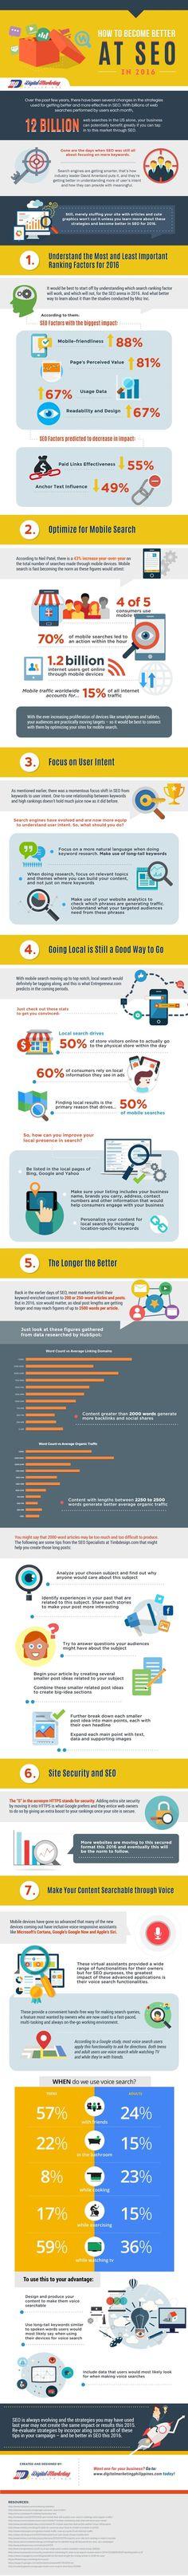 seo-basics-infografik-xlarge   t3n